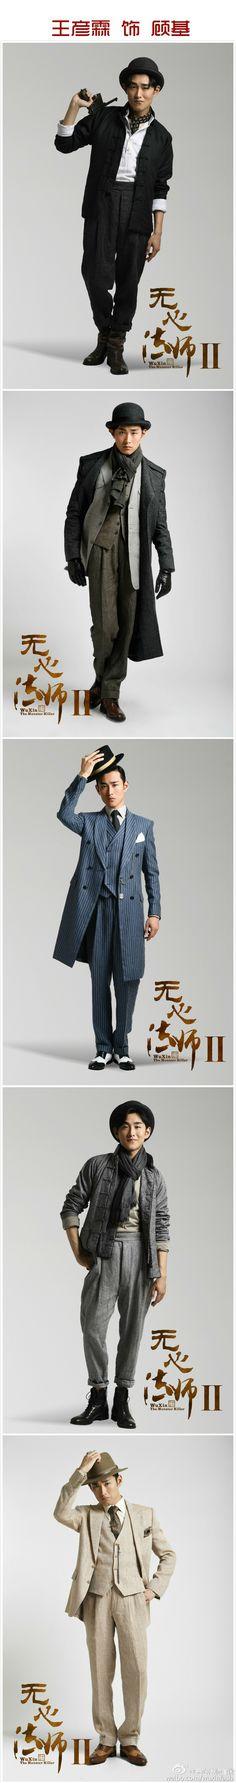 Wuxin: The Monster Killer 2 《无心法师2》 - Elvis Han, Li Lan Di, Ian Wang, Sebrina Chen, Mike D. Angelo, Damian Lau.